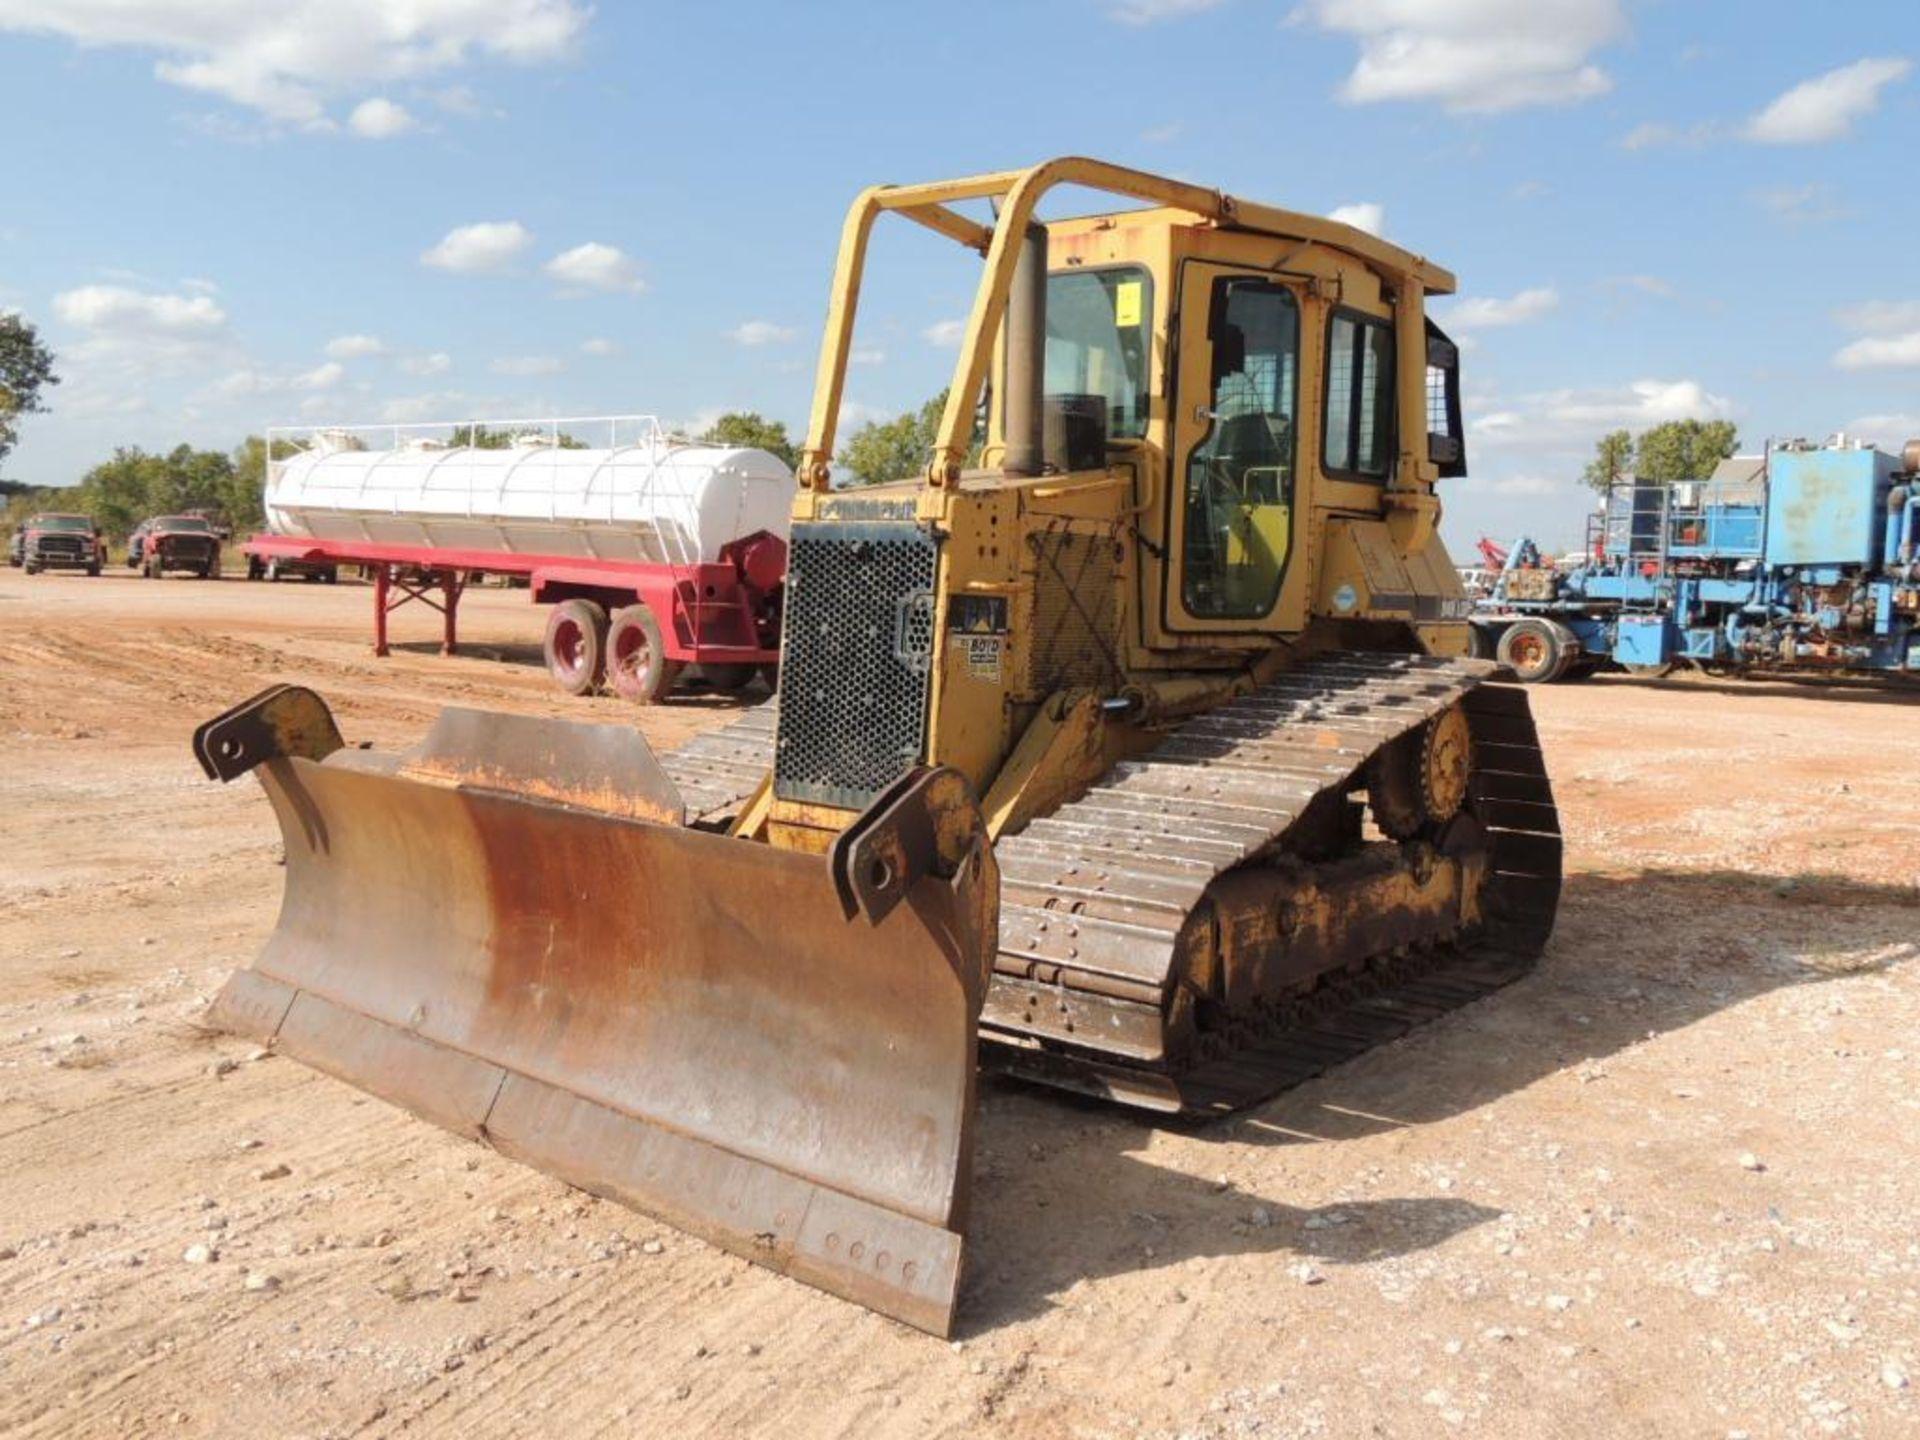 1996 Caterpillar D4H-LGP Series III Crawler Tractor, 6 Way Blade, 30 In. Grousers, 7570 Hrs.